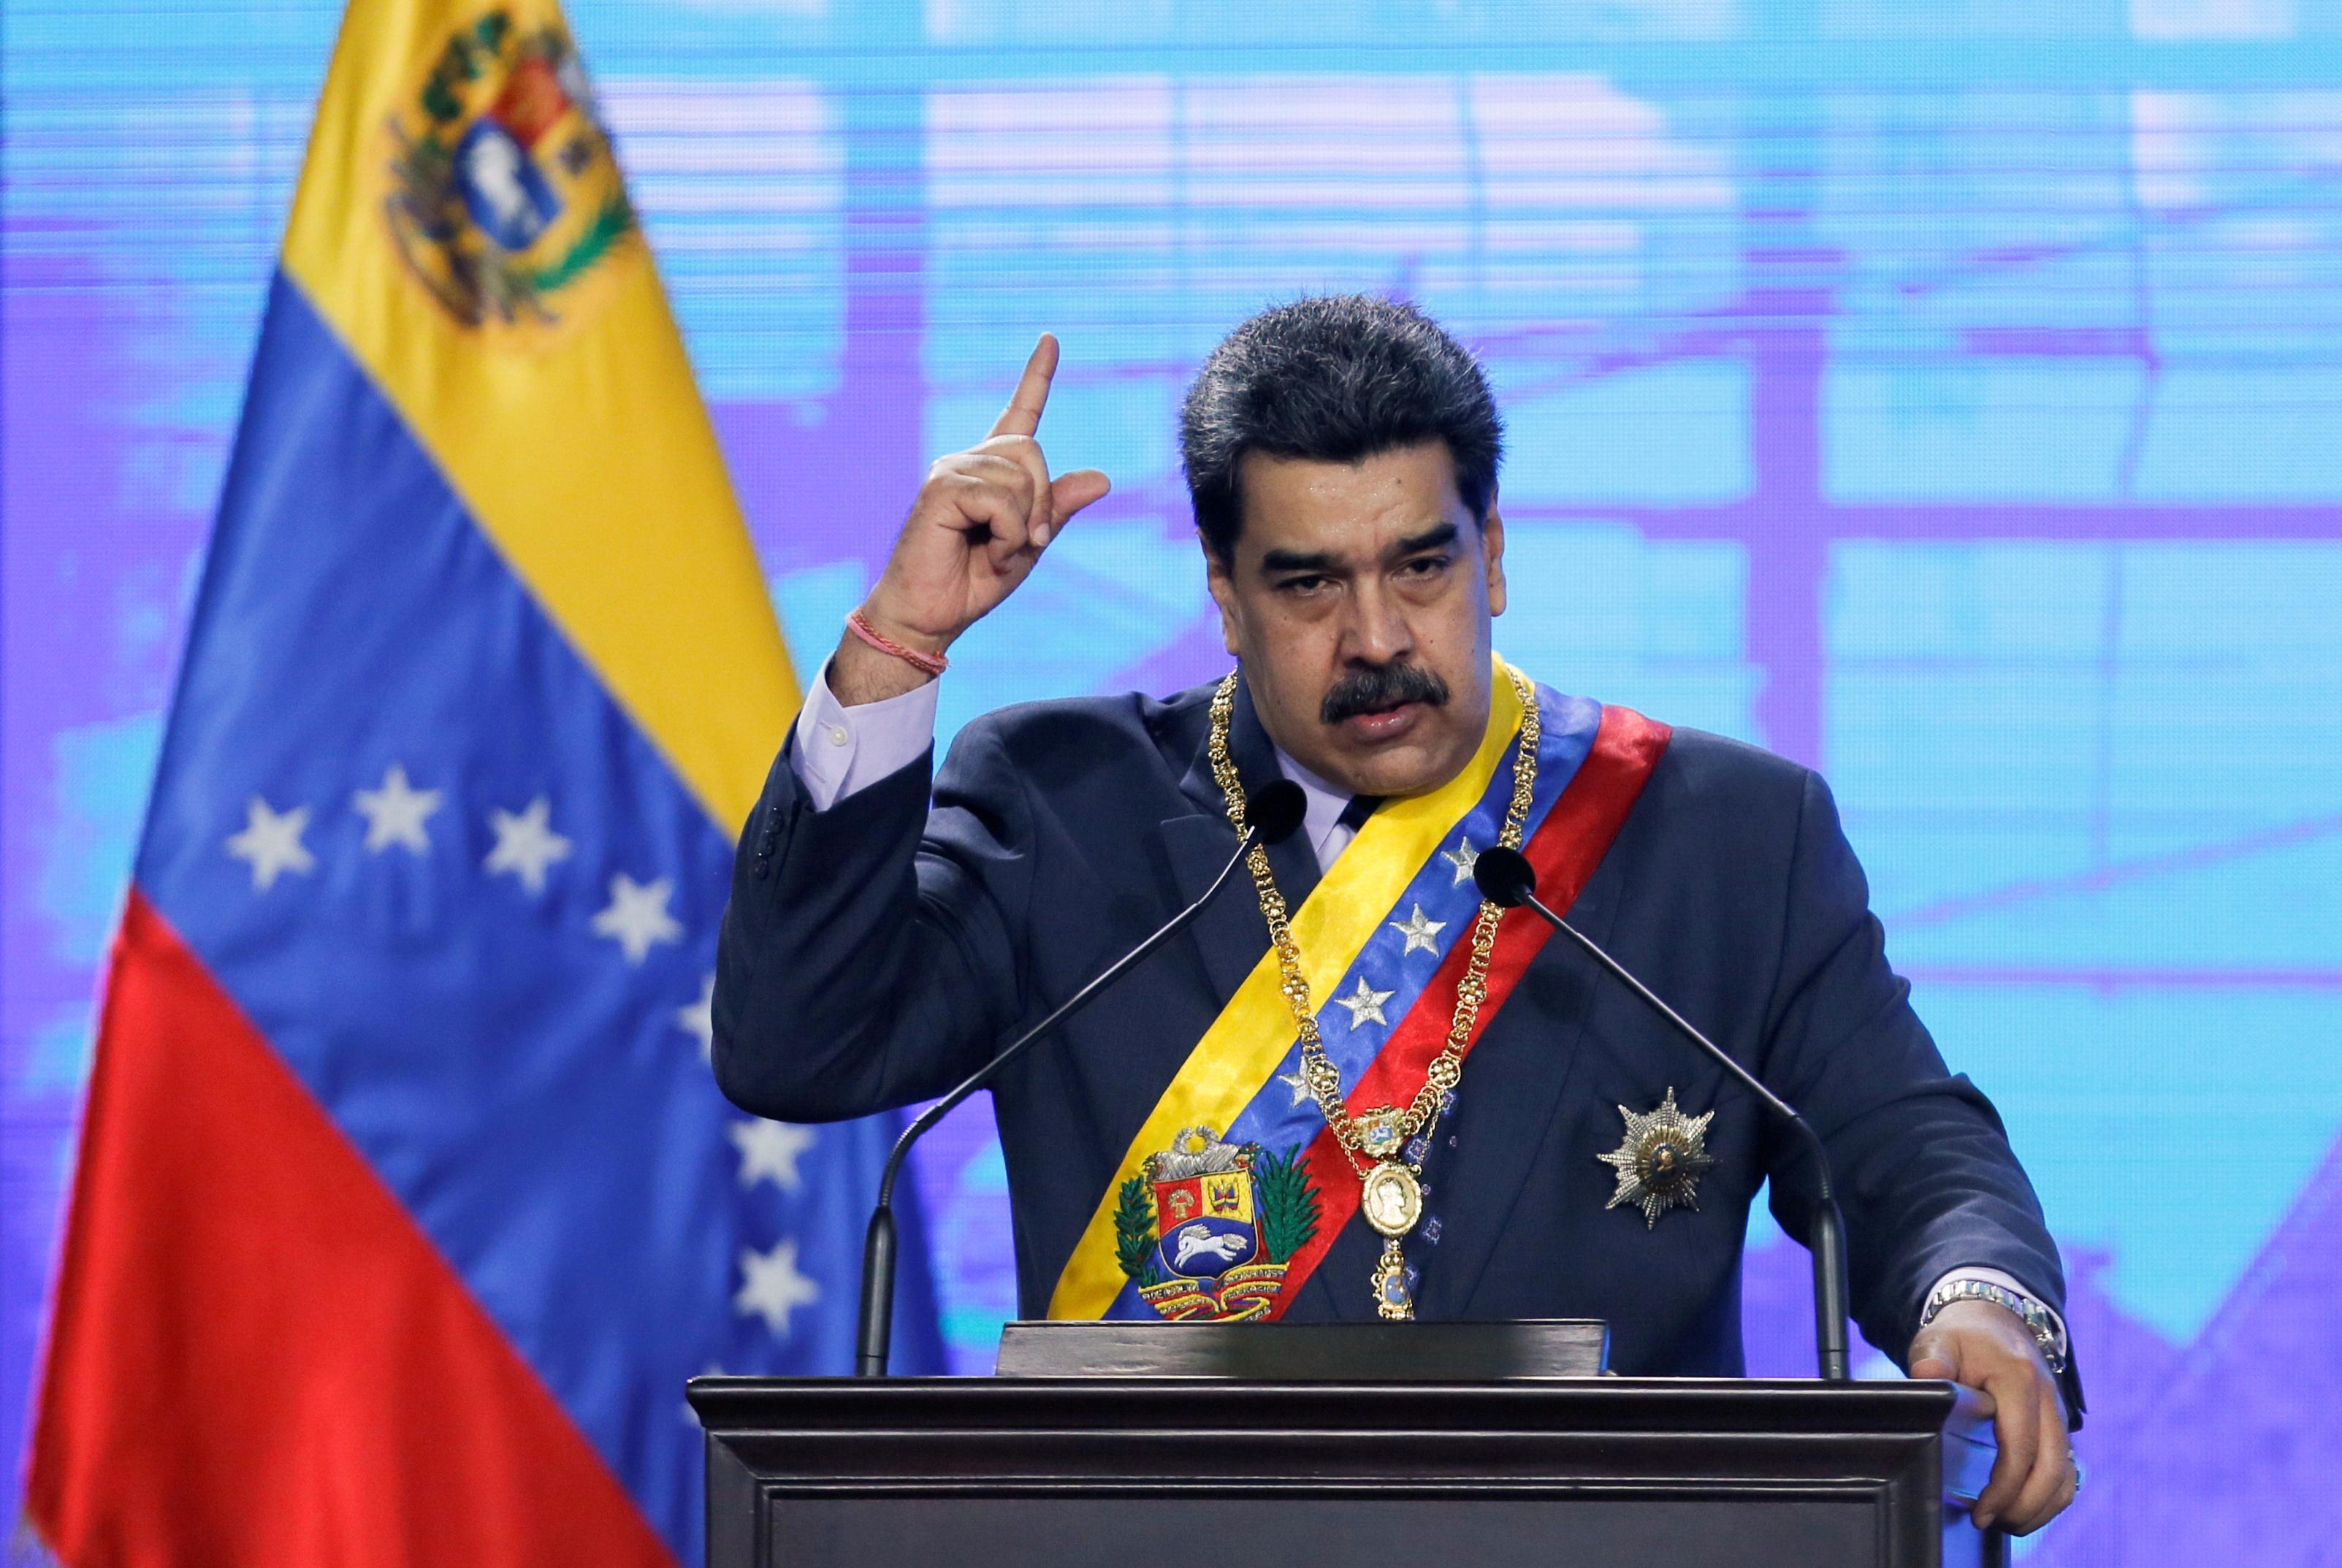 Venezuela's President Nicolas Maduro speaks during a ceremony marking the opening of the new court term in Caracas, Venezuela January 22, 2021. REUTERS/Manaure Quintero/File Photo